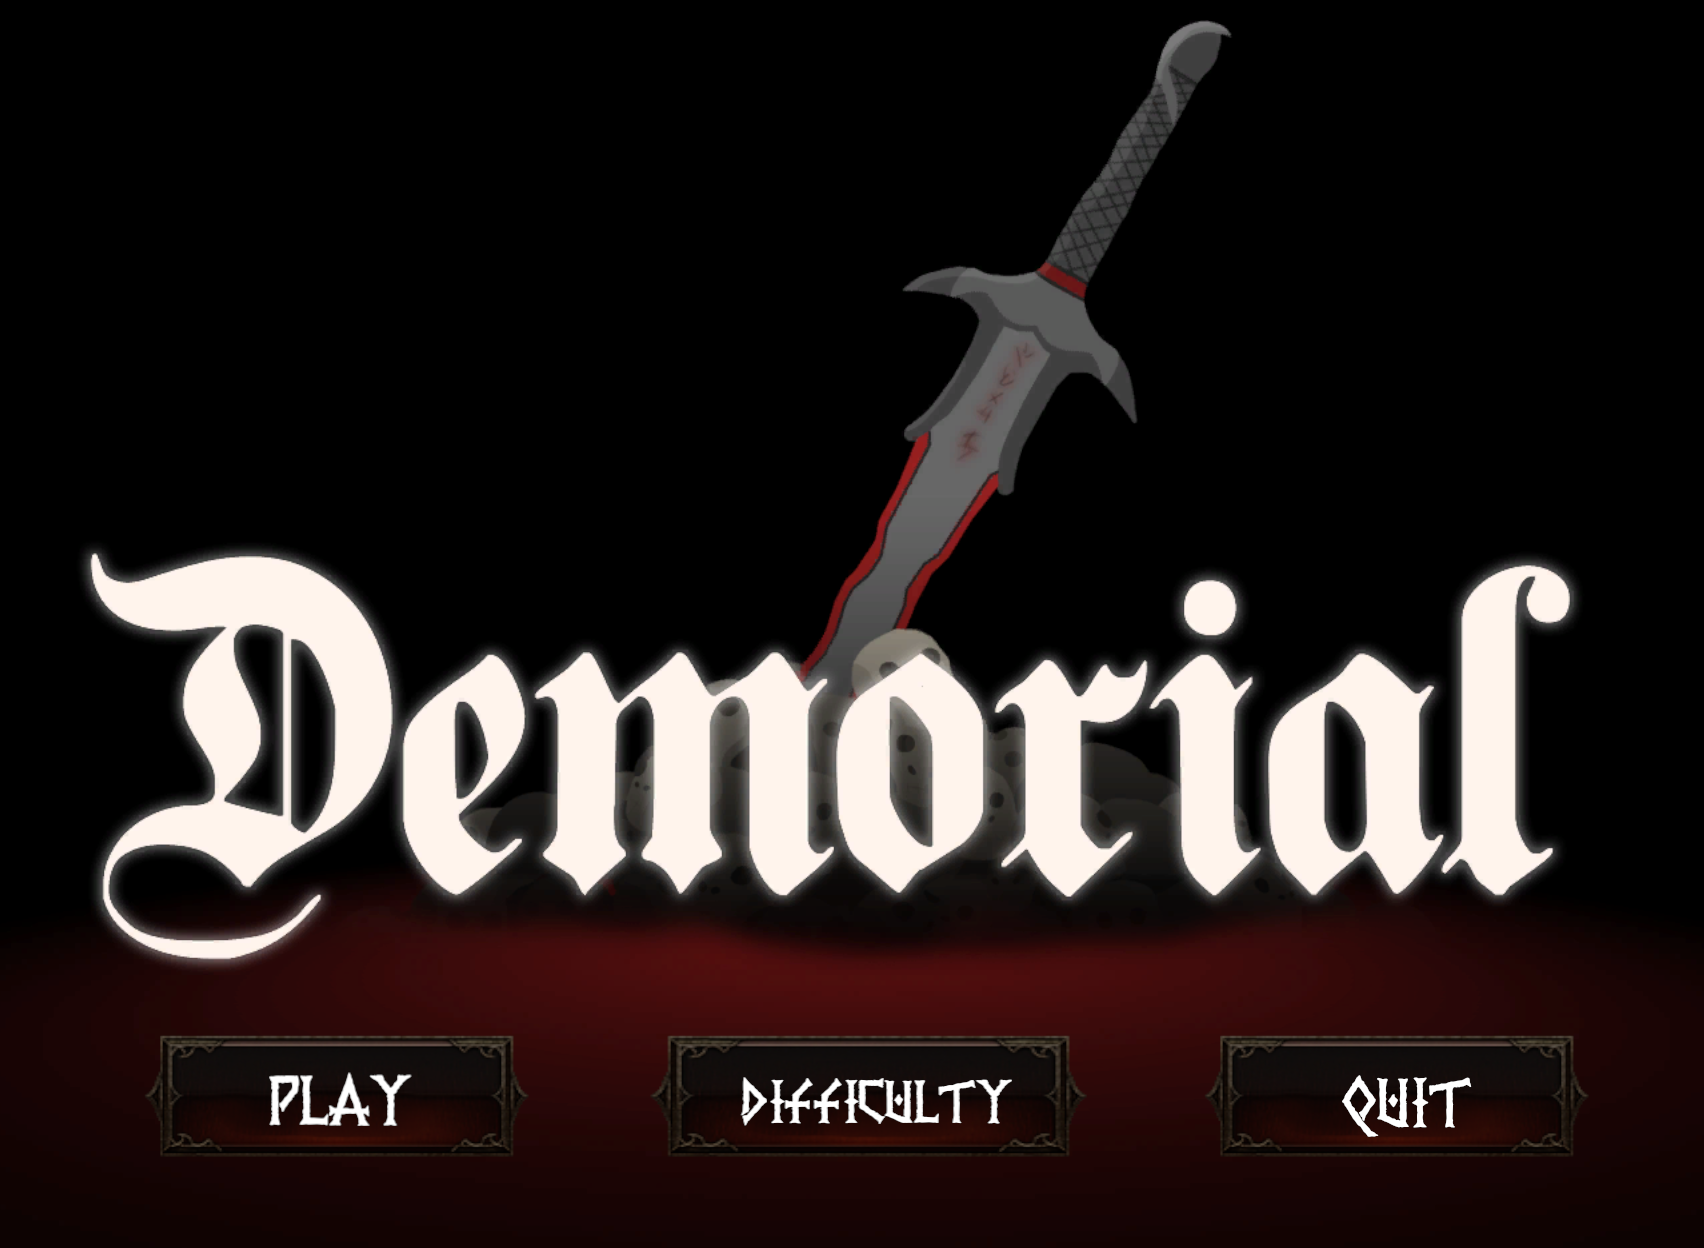 DemorialThumbnail.PNG